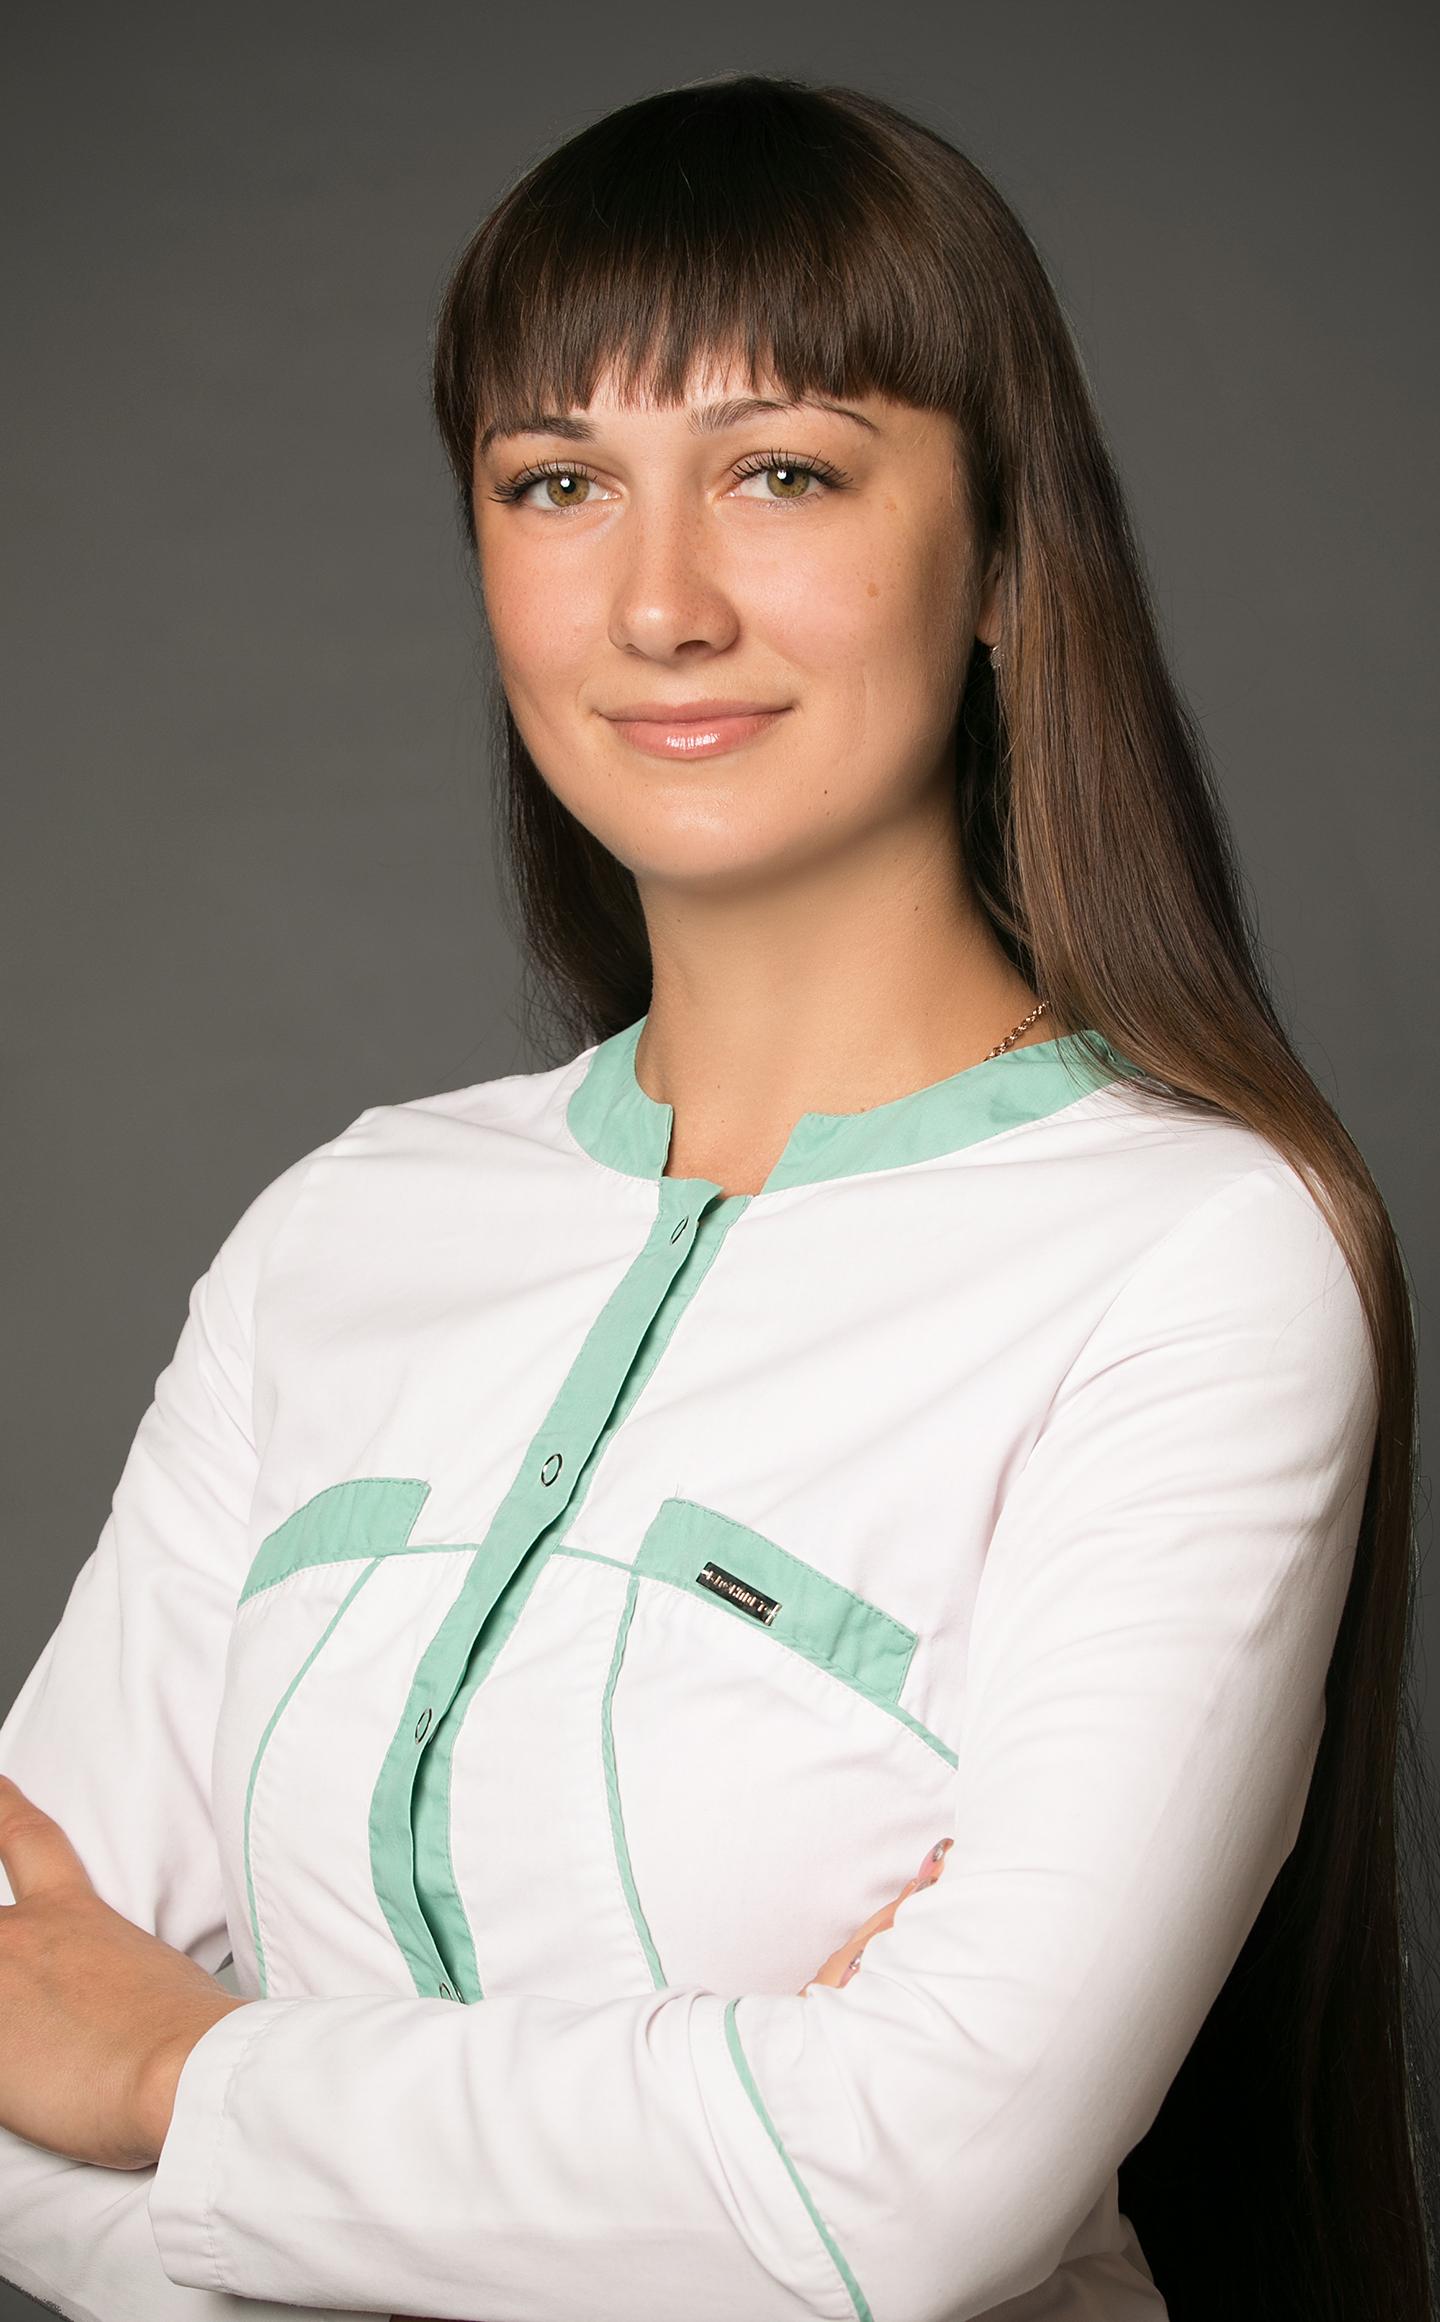 Новикова Анна Юрьевна